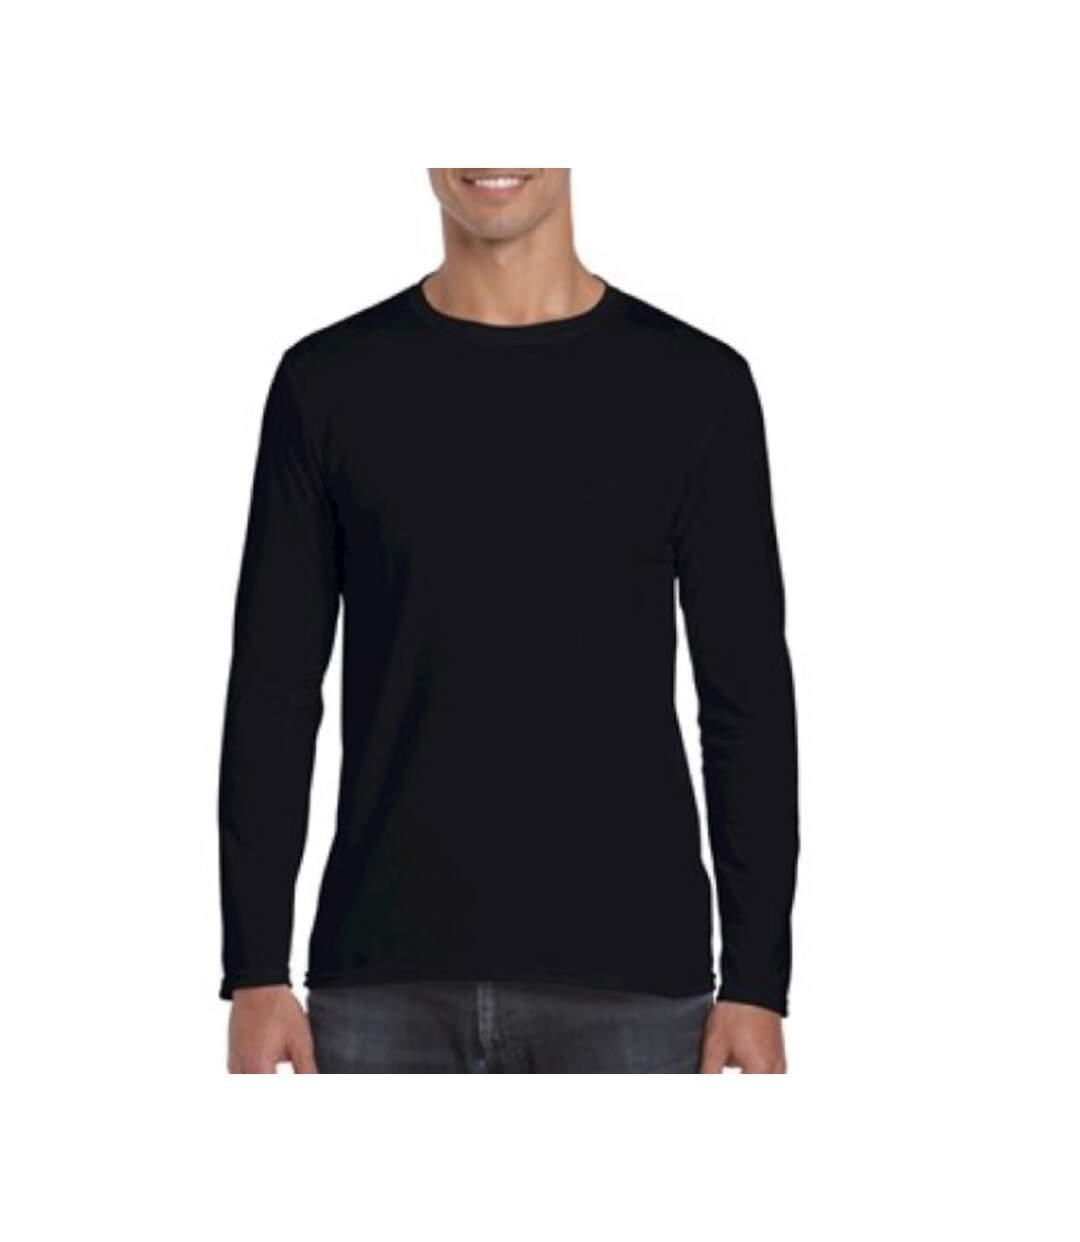 Gildan Mens Soft Style Long Sleeve T-Shirt (Pack Of 5) (Royal) - UTBC4808